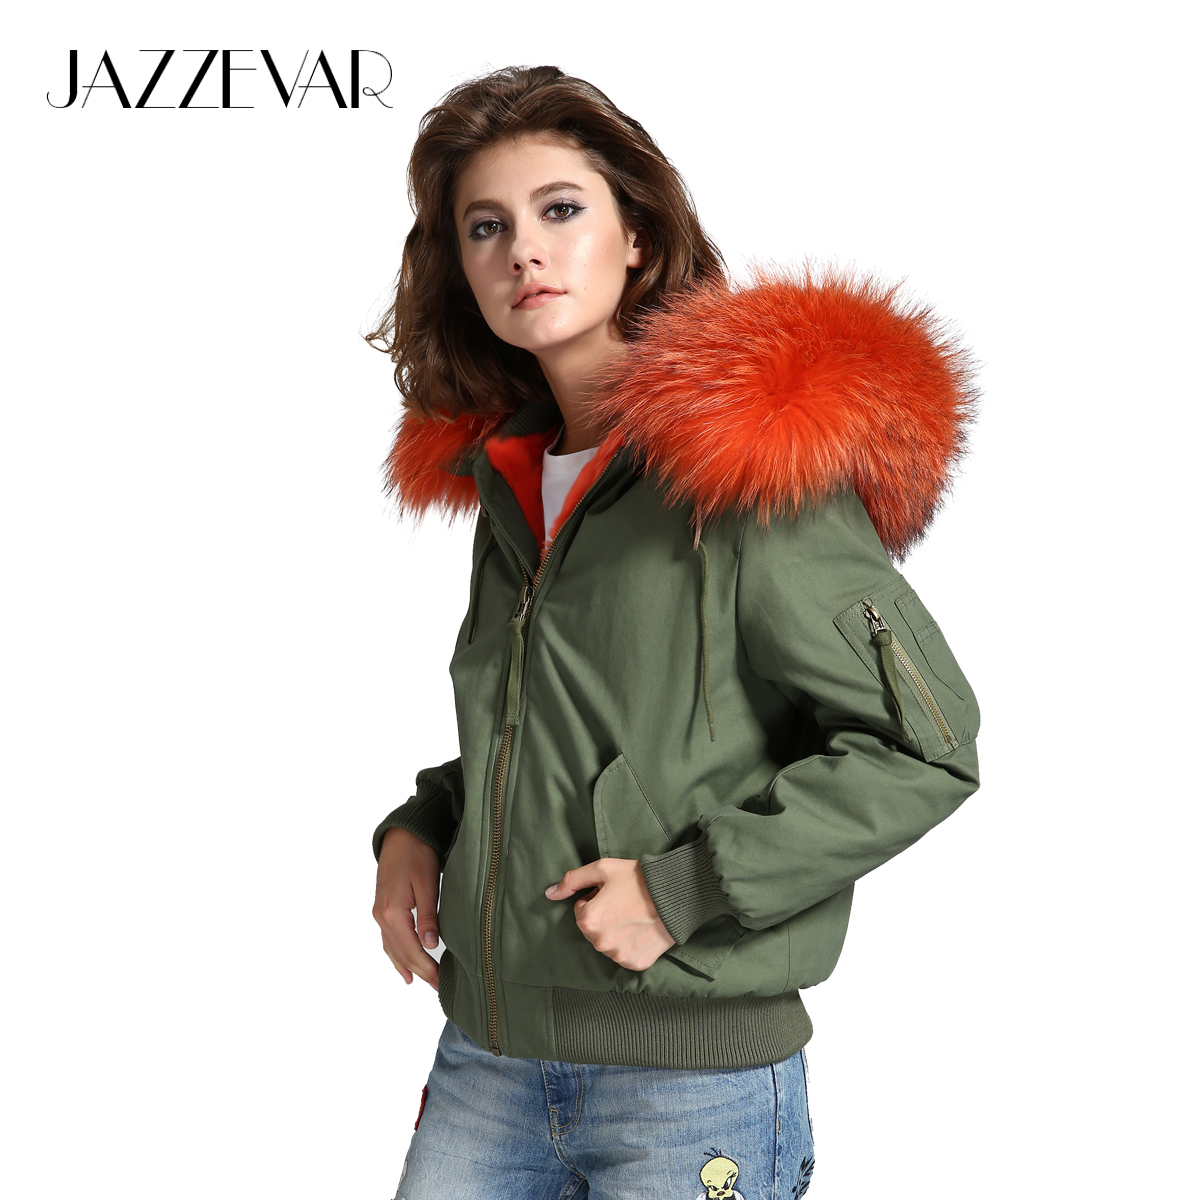 JAZZEVAR 2019 High fashion street women s army green winter jacket female warm bomber coat hooded